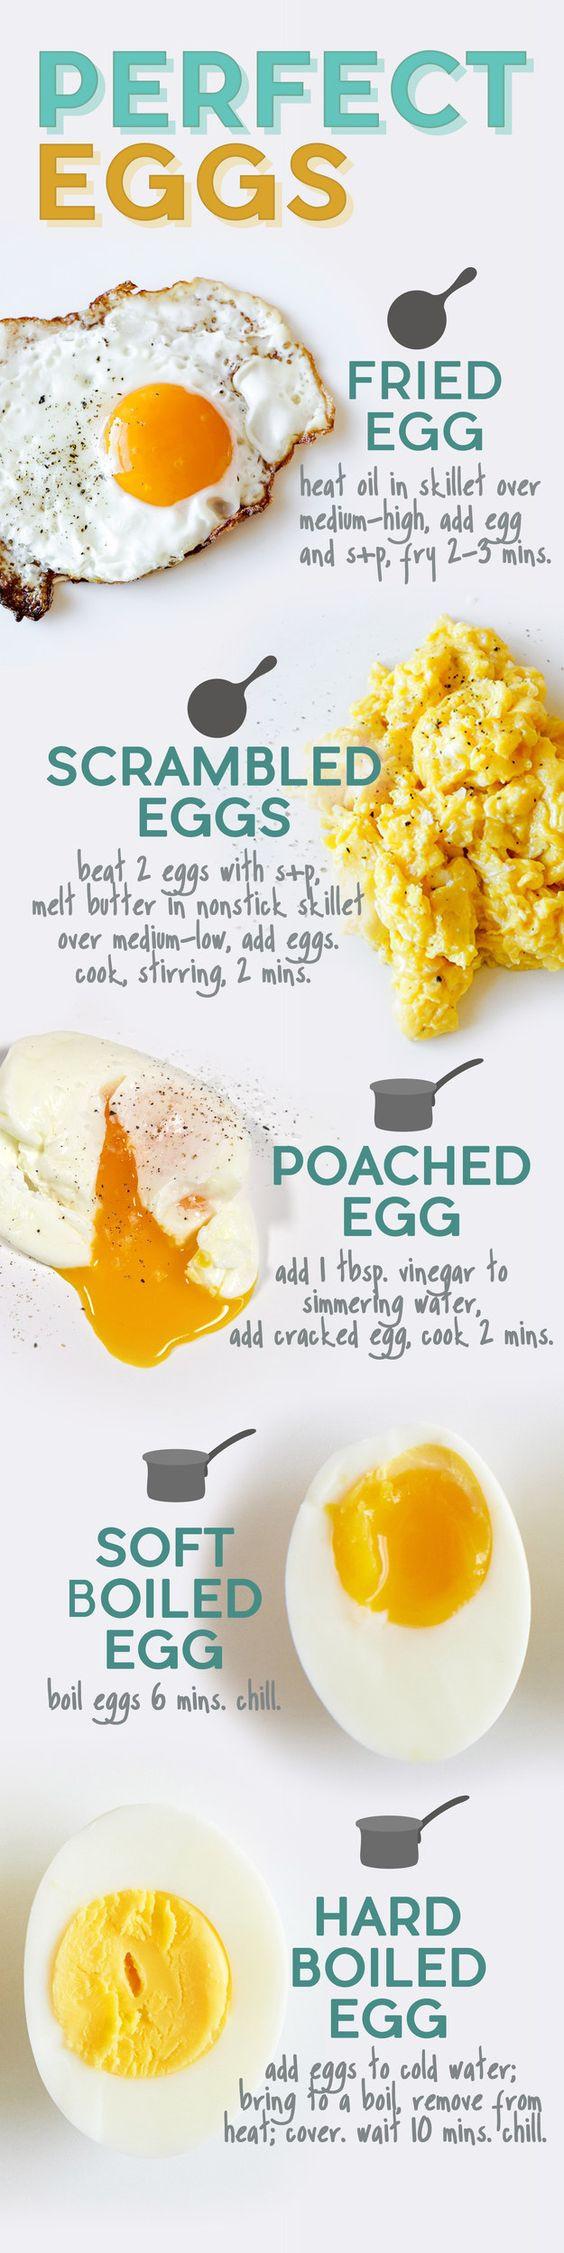 https://www.buzzfeed.com/alisonroman/how-to-cook-eggs?utm_term=.gdO01lnKX#.yn0yYV8mp